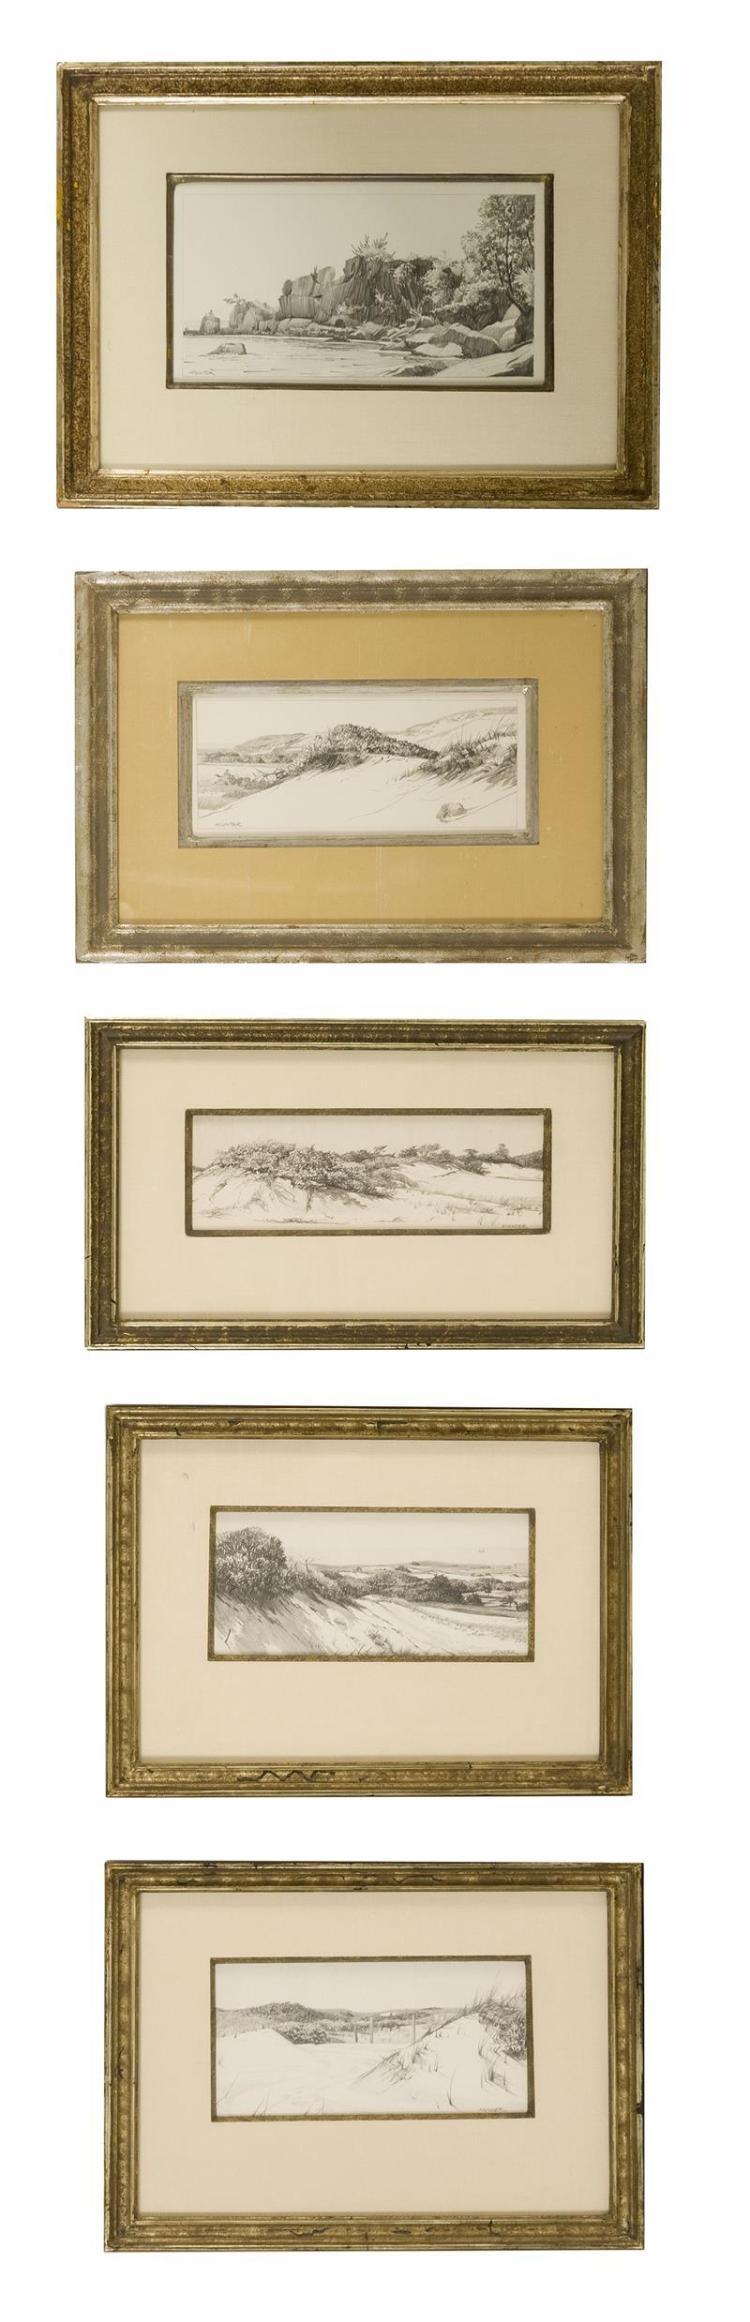 "ROBERT DOUGLAS HUNTER, Massachusetts, 1928-2014, Five pencil drawings of dune scenes., On paper, approx. 4"" x 8"" sight. Framed appro..."